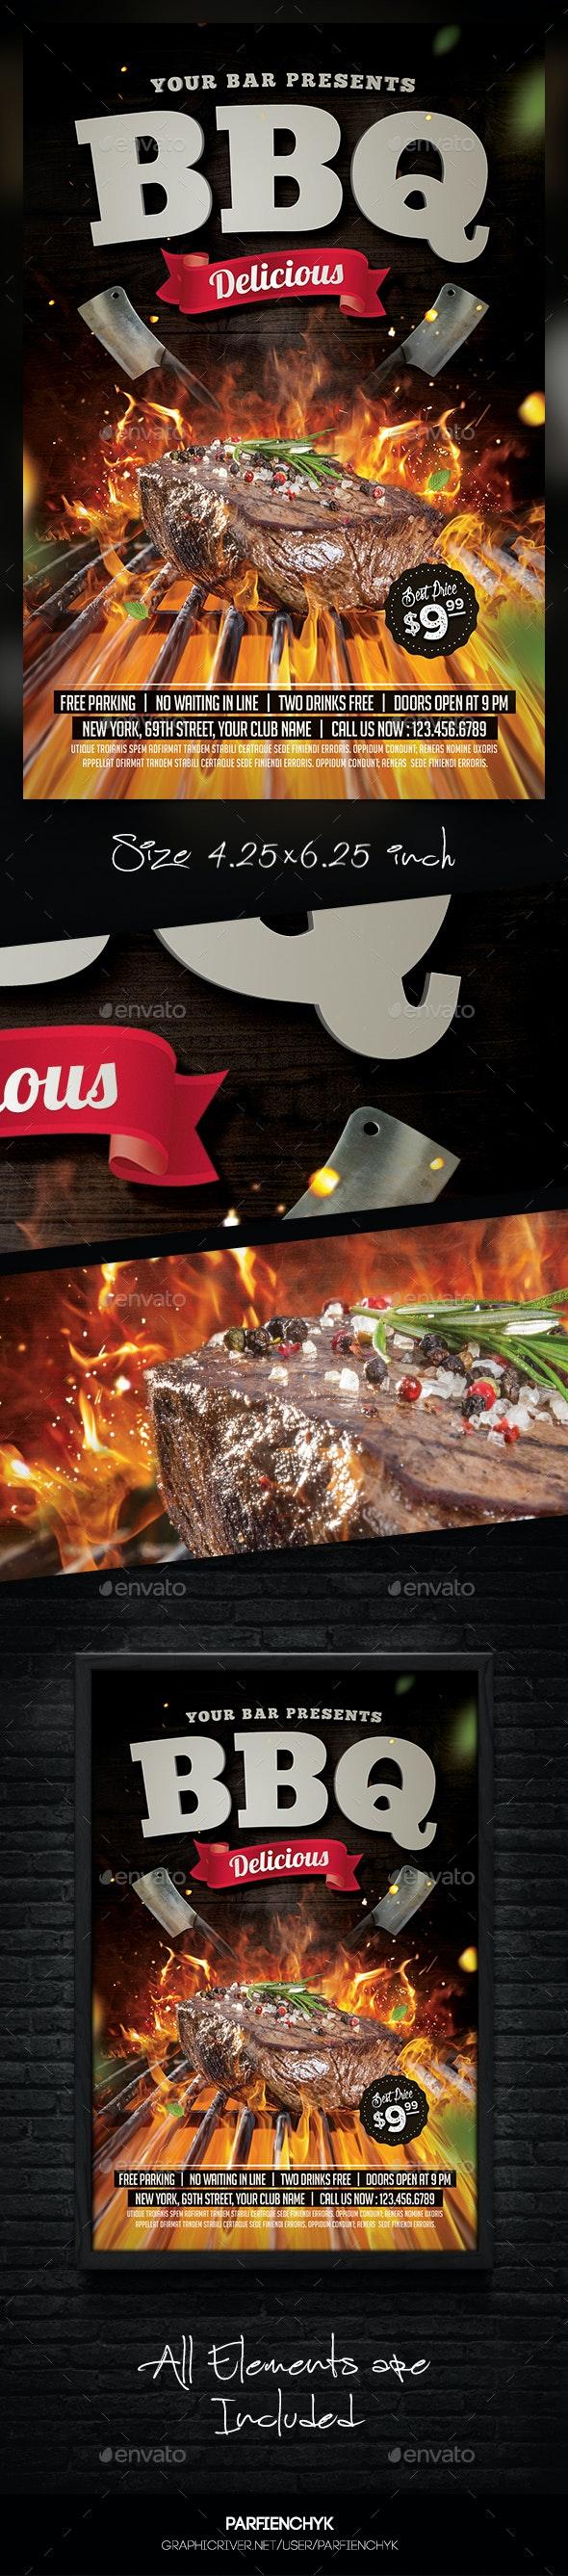 Steak BBQ Flyer Template - Restaurant Flyers